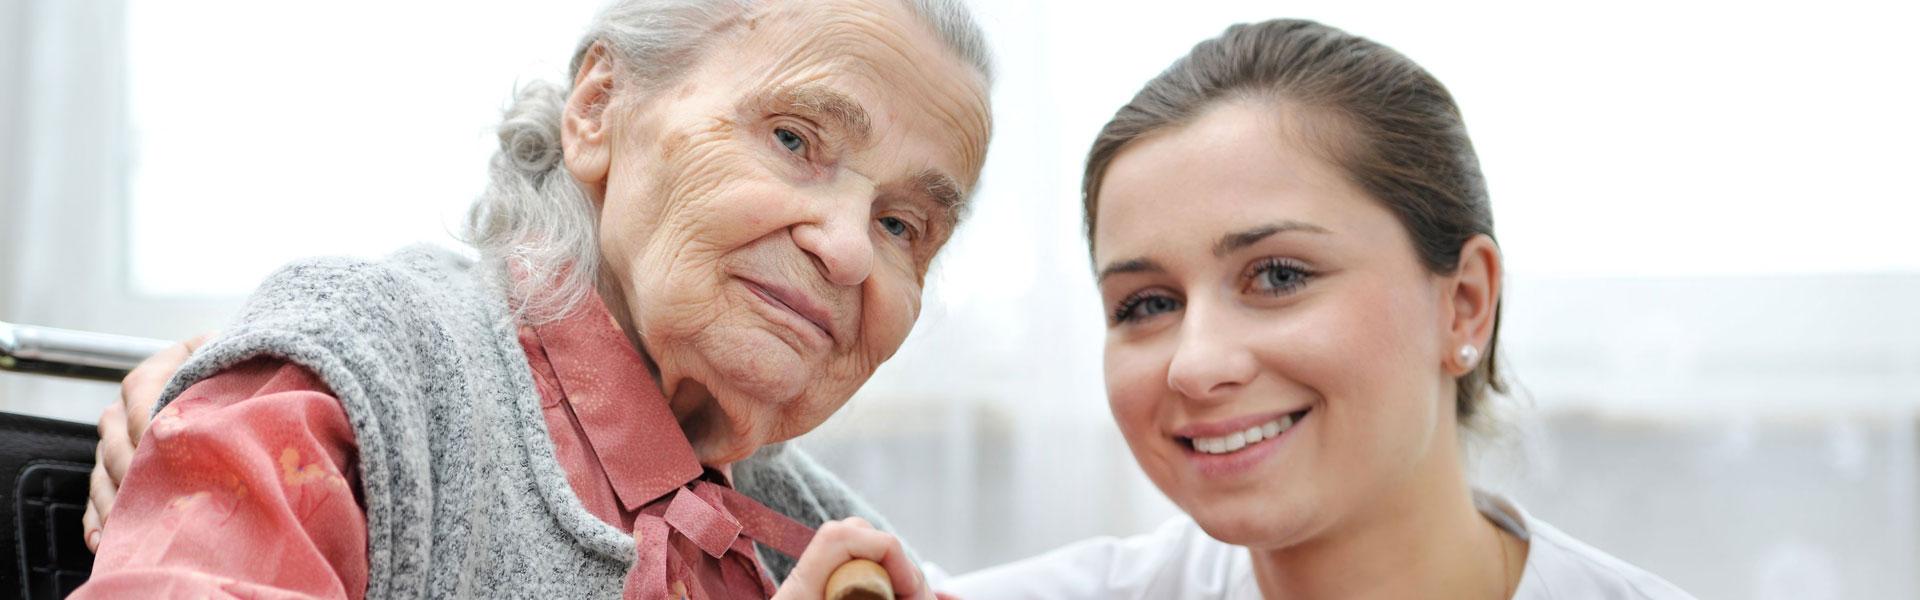 Tips for Hiring Overnight Care for an Elderly Loved One